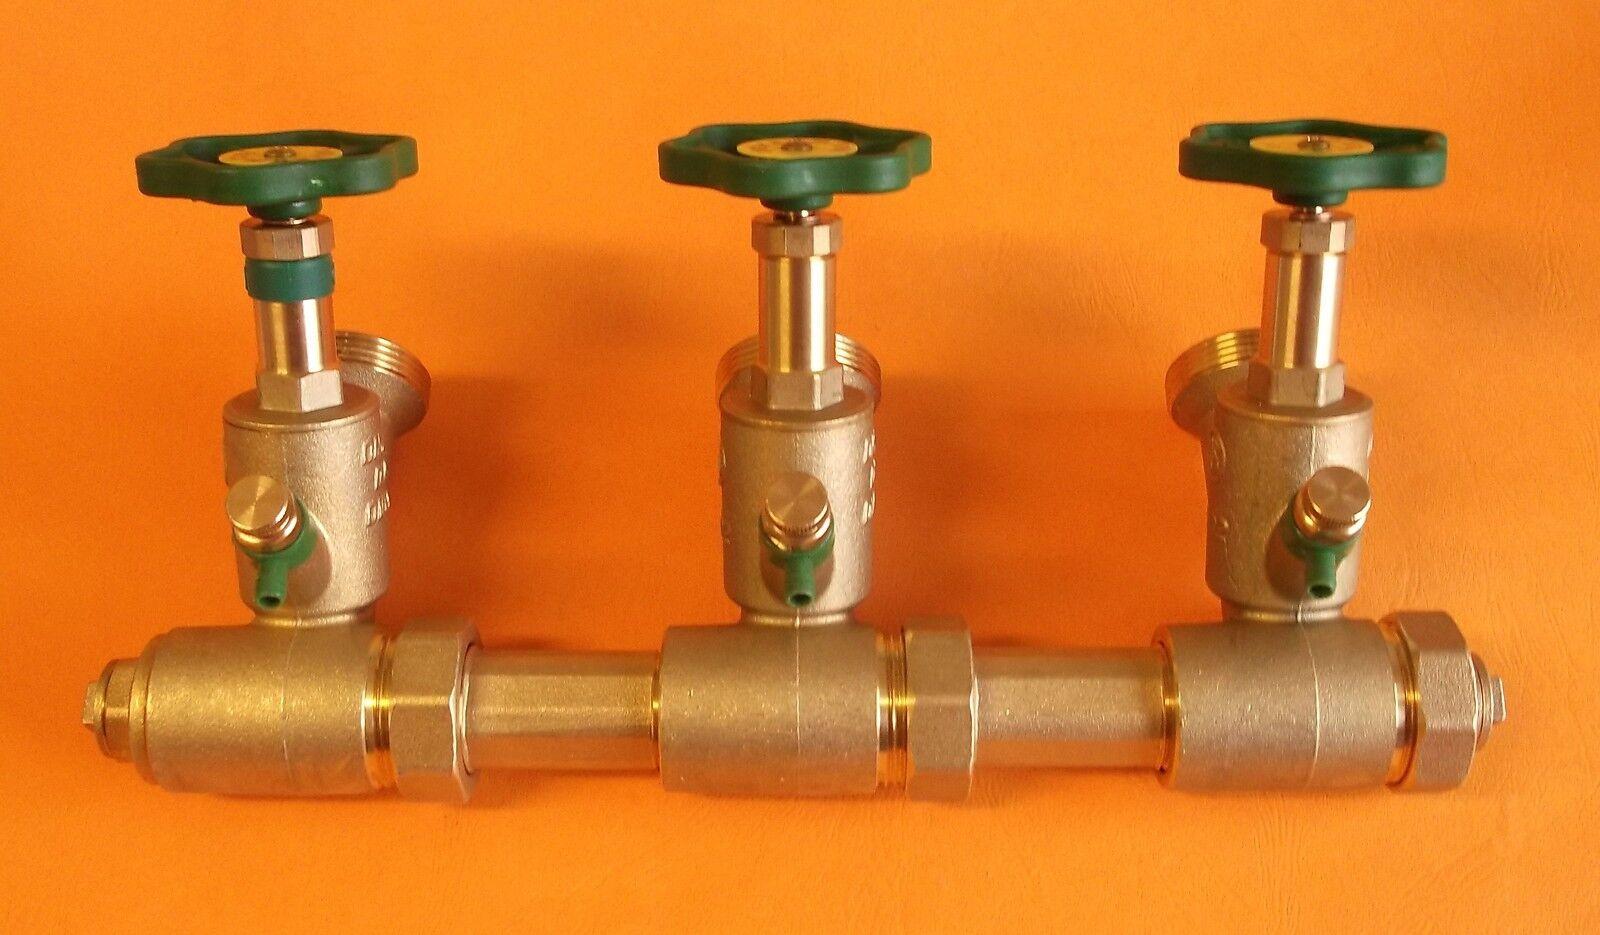 Schlößer Verteiler Kompaktverteiler Wasserverteiler DN25 A DN40, 3fach   9300264